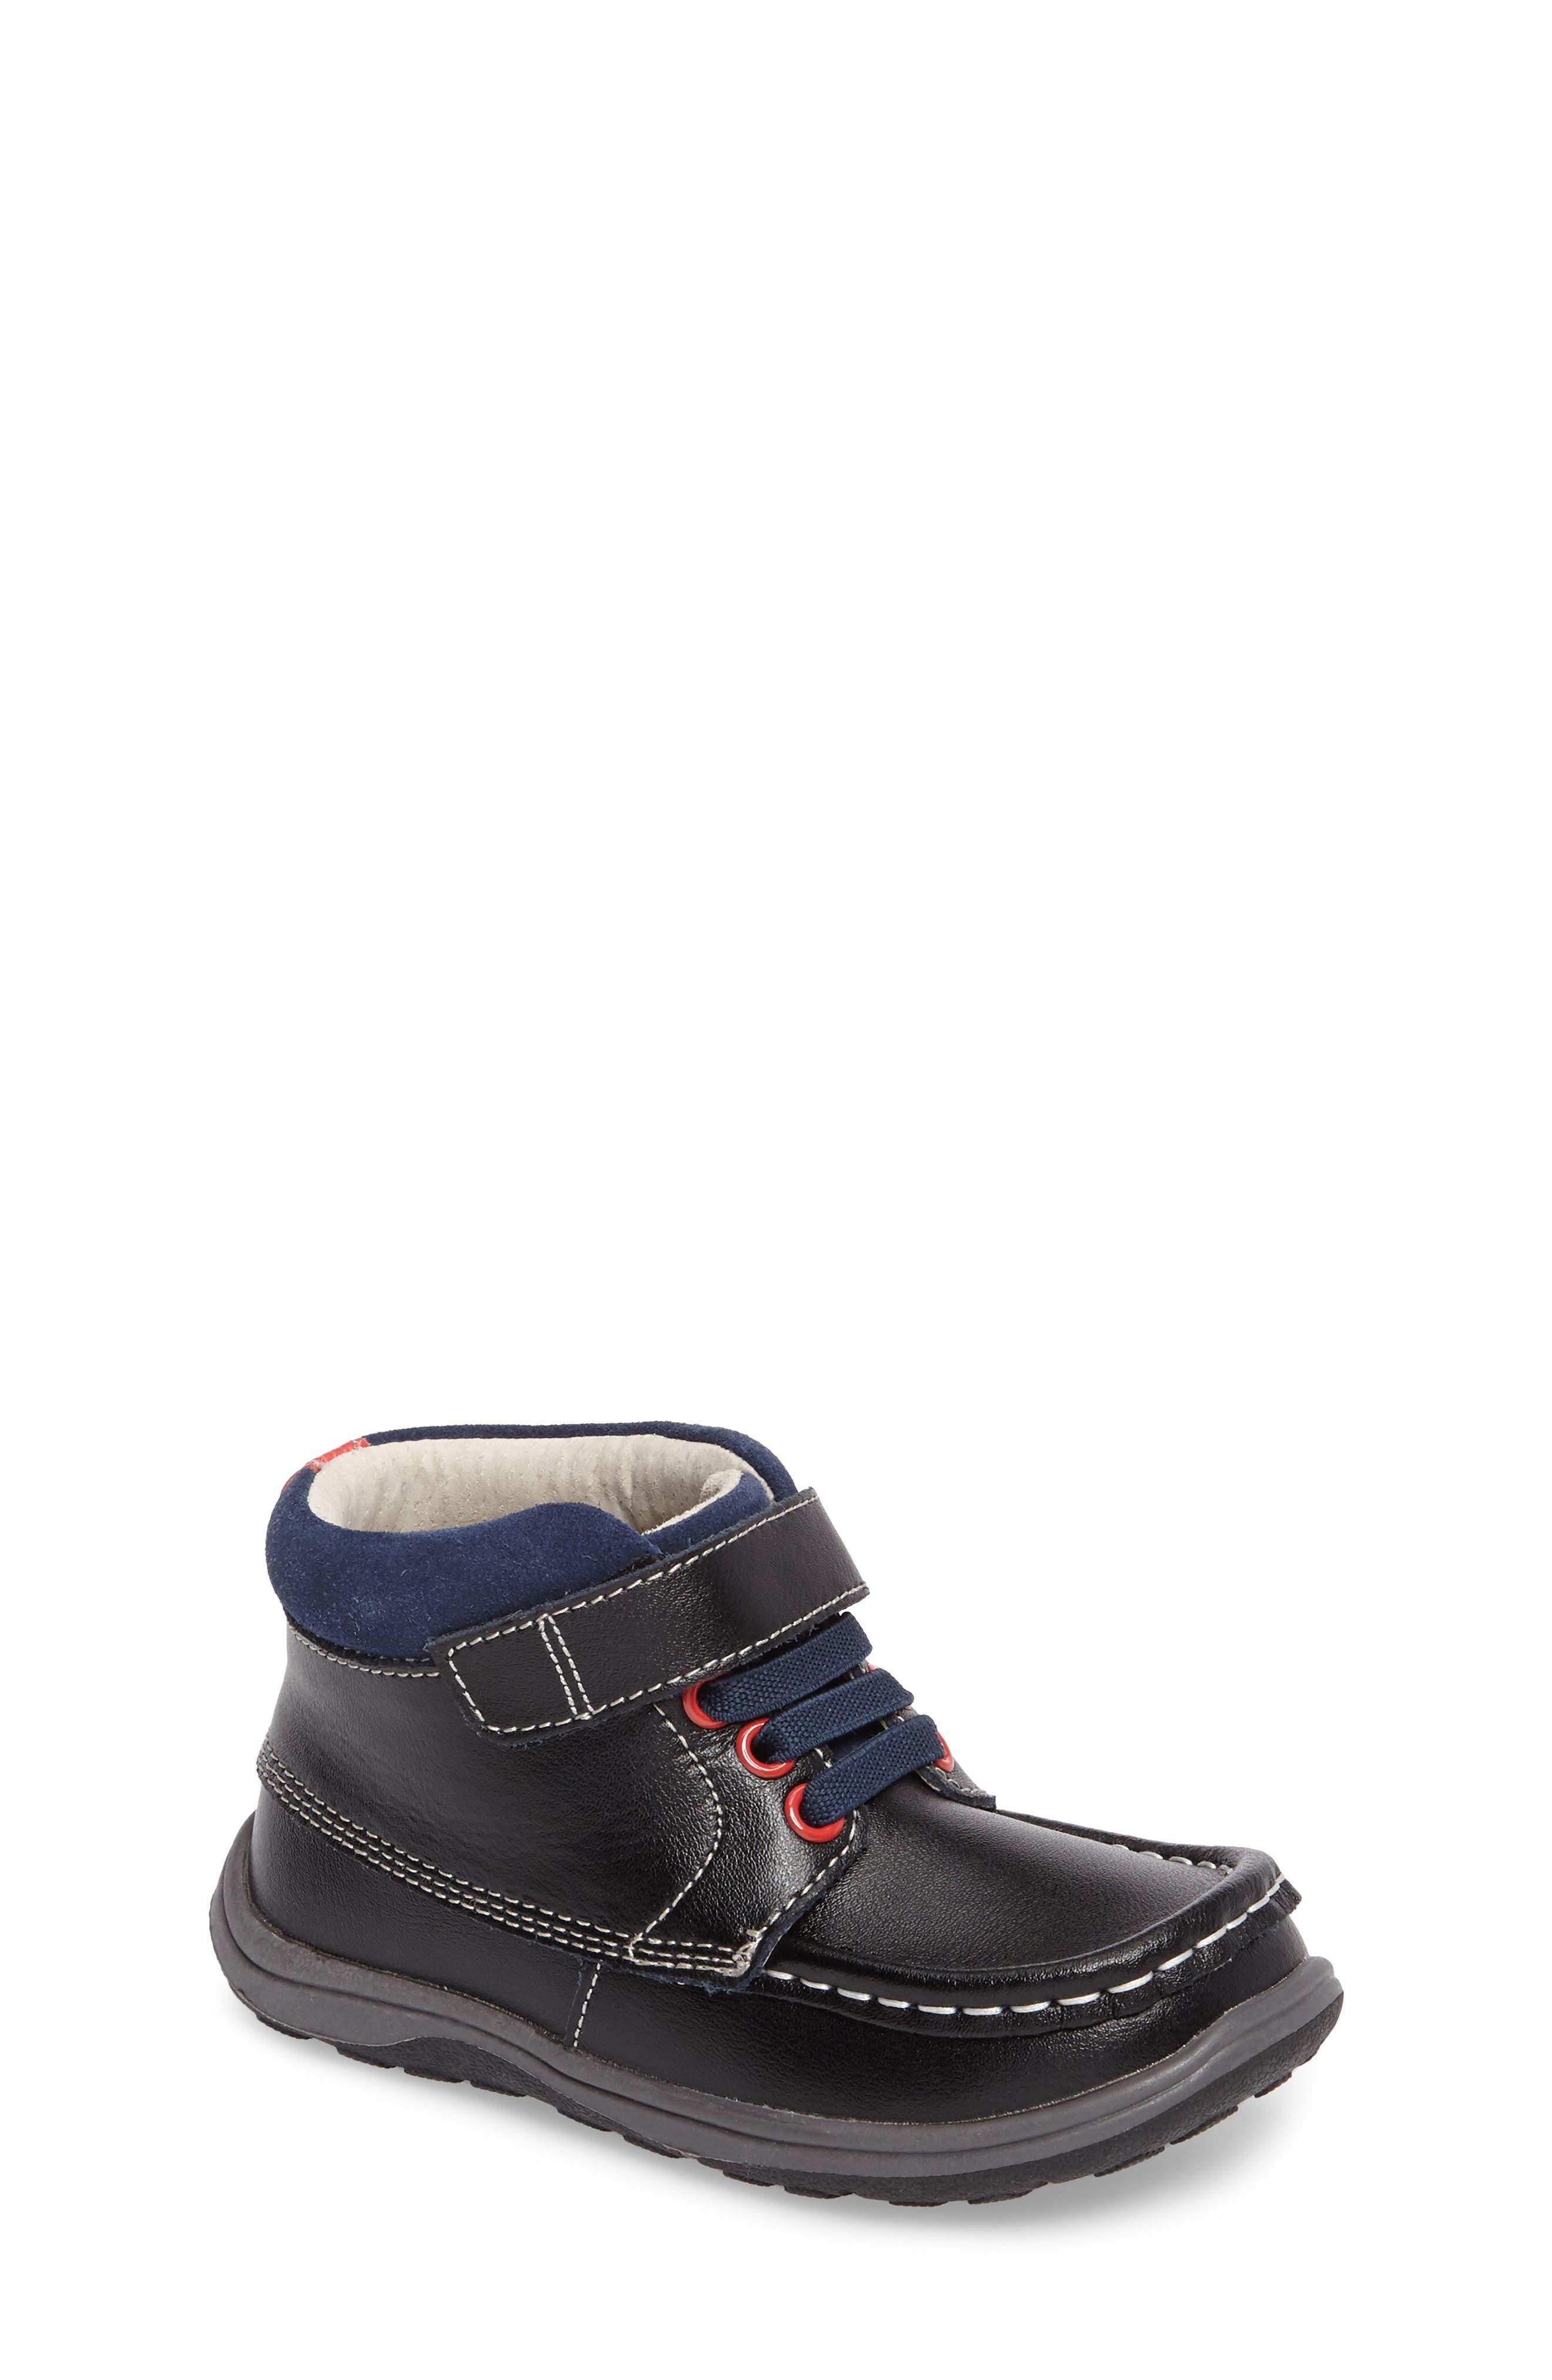 Alternate Image 1 Selected - See Kai Run Owen High Top Sneaker Bootie (Baby, Walker & Toddler)